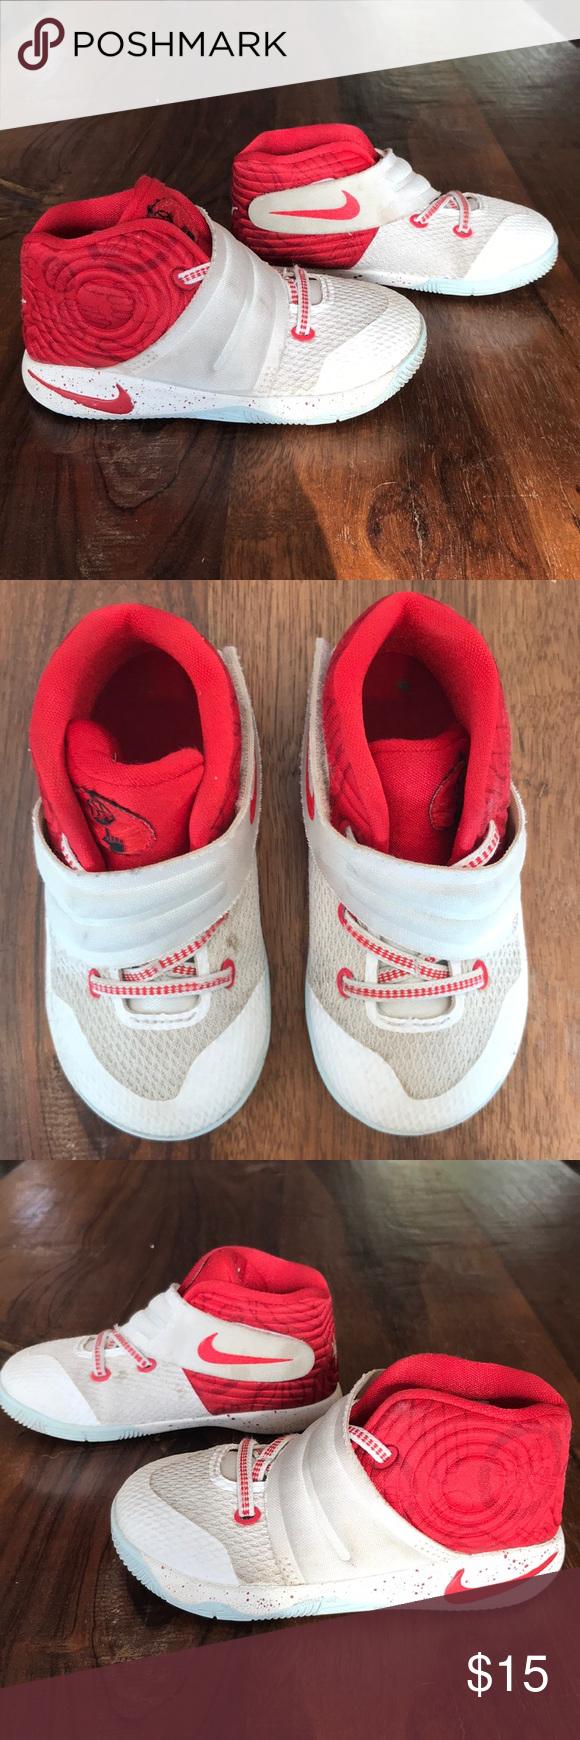 White JBY Basketball Shoes | Nike kyrie